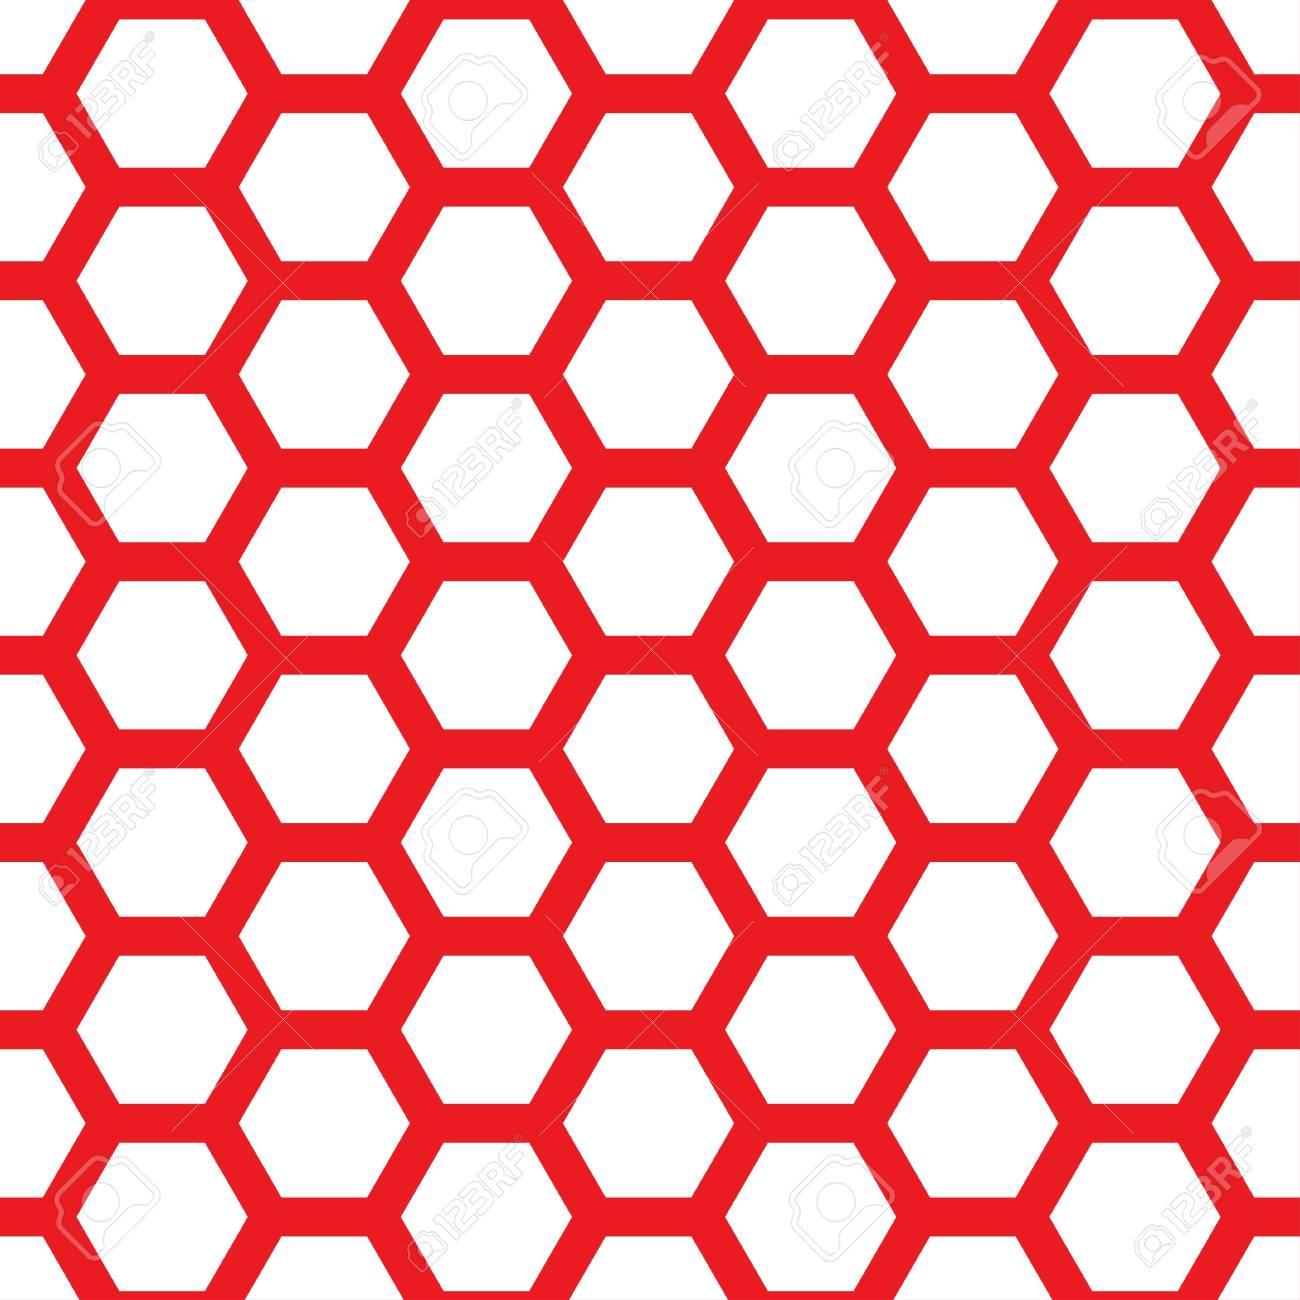 Seamless geometric pattern with honeycombs - 114708574